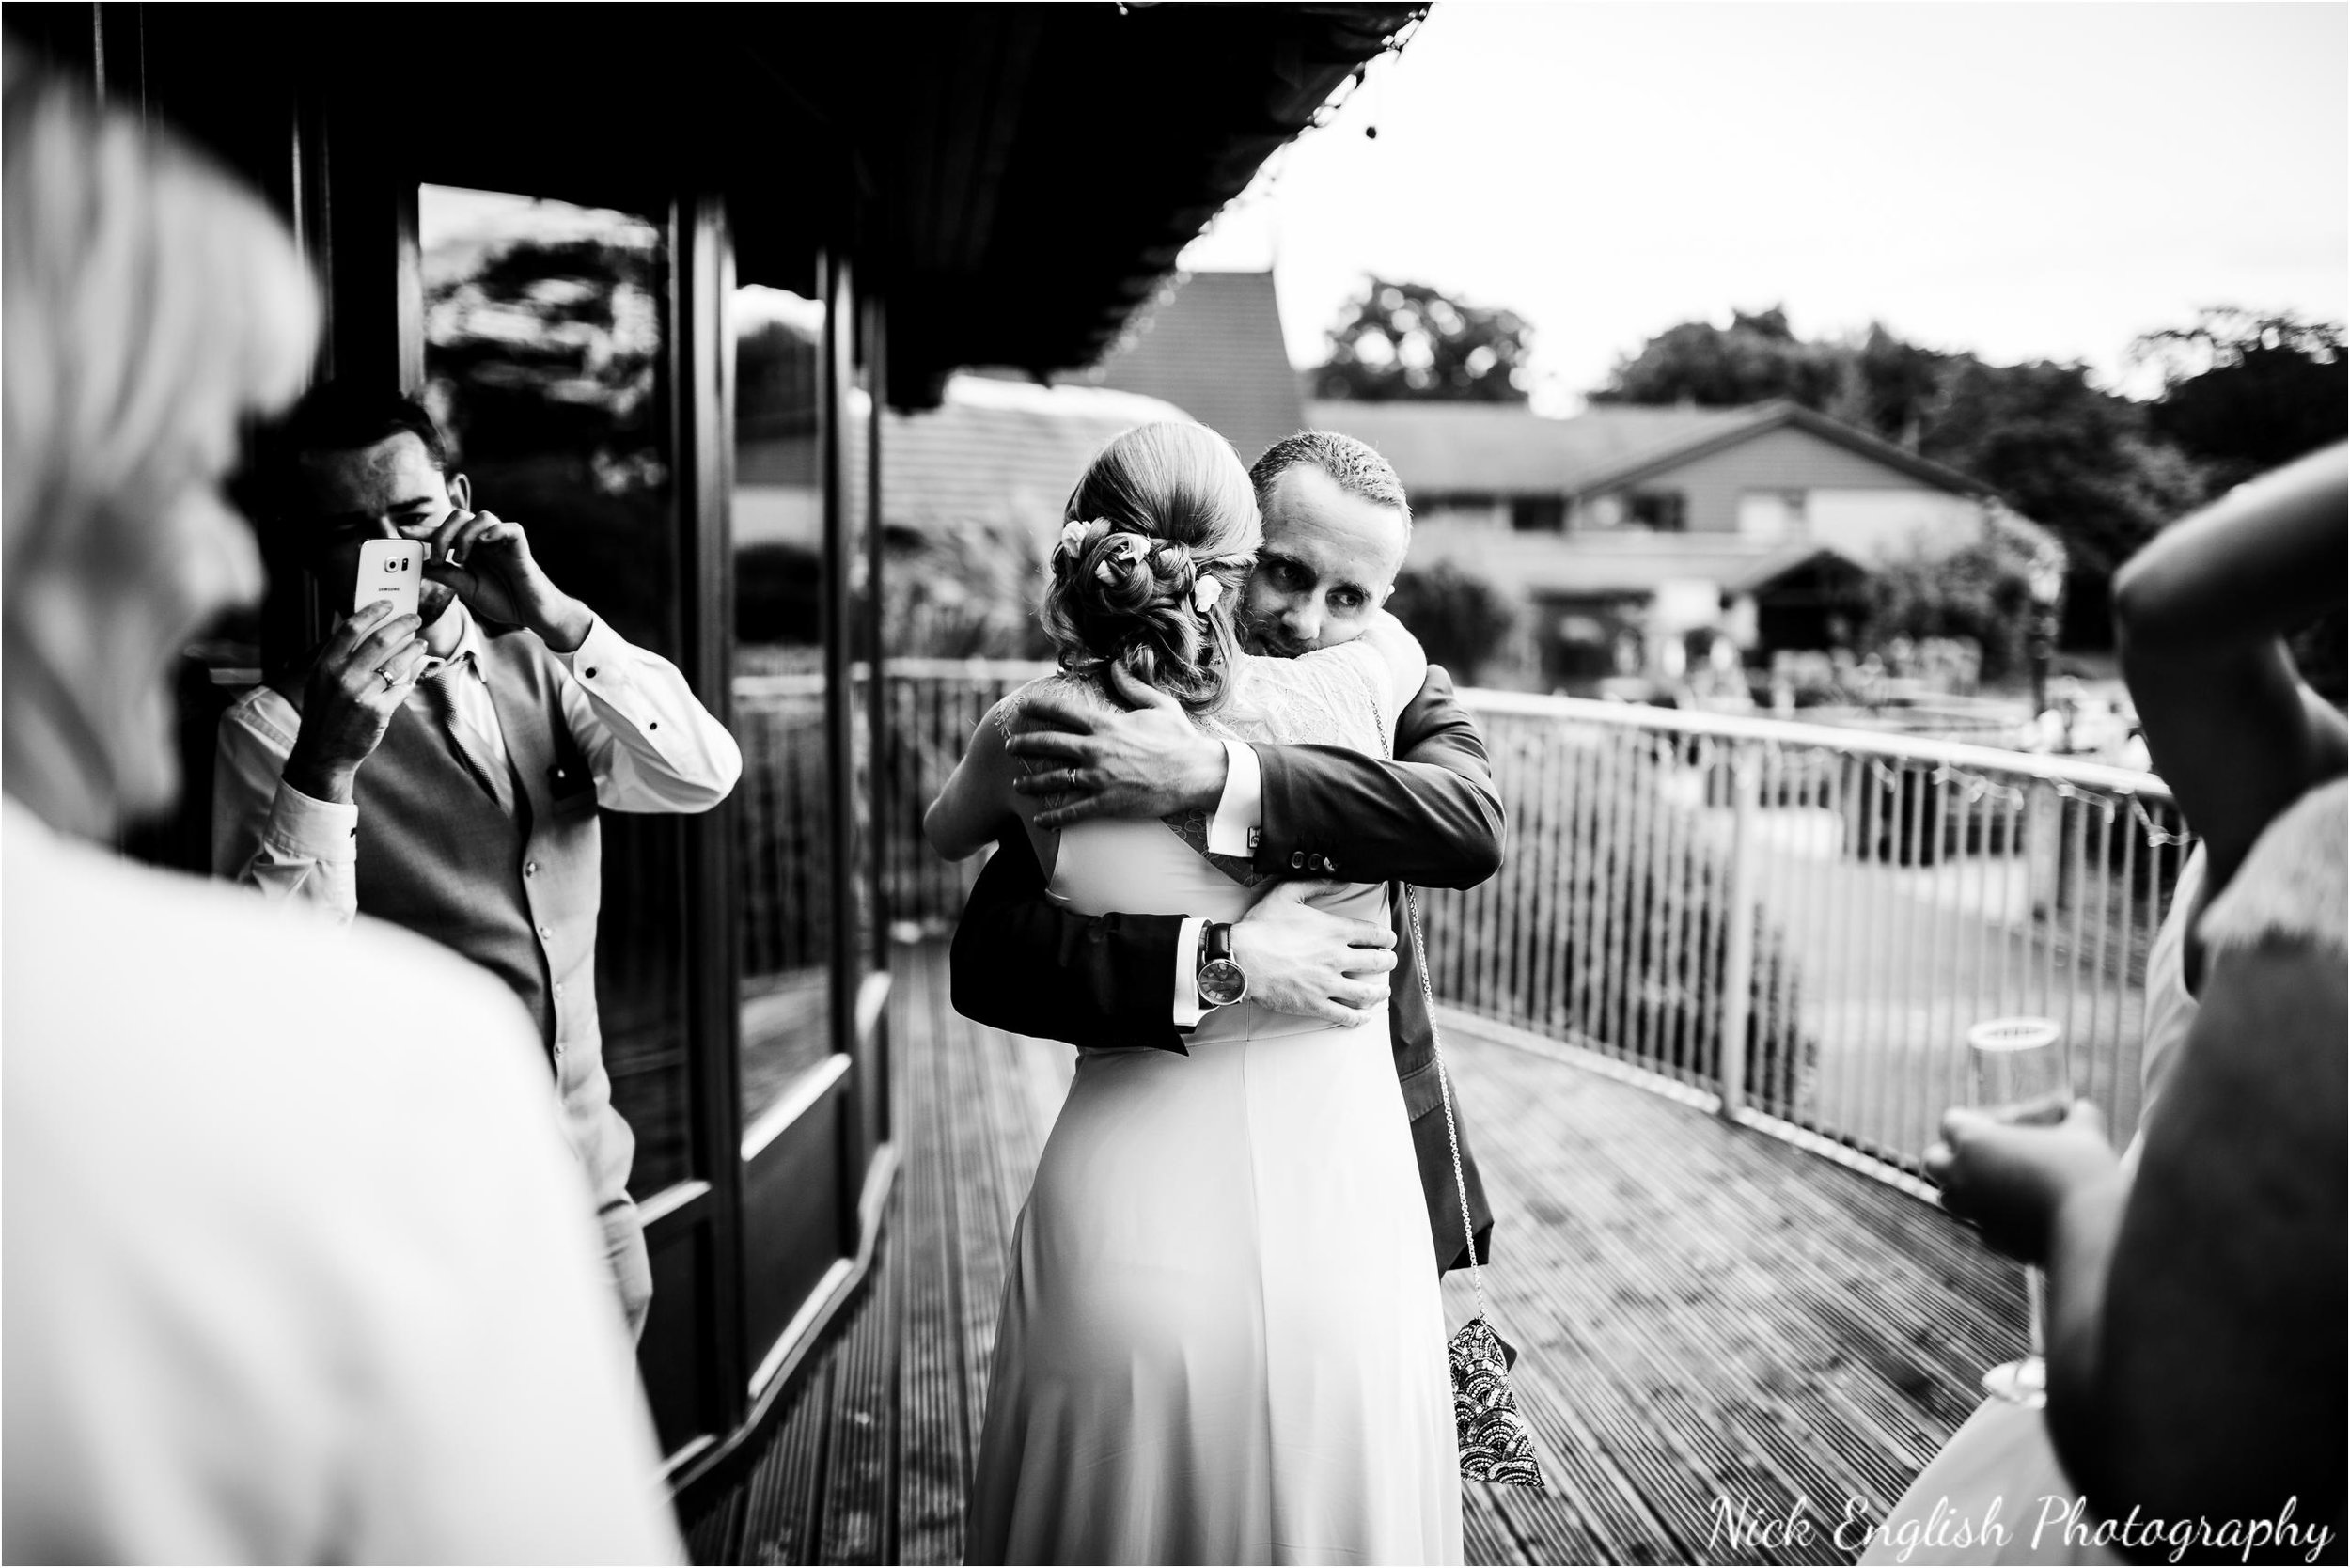 Emily David Wedding Photographs at Barton Grange Preston by Nick English Photography 209jpg.jpeg